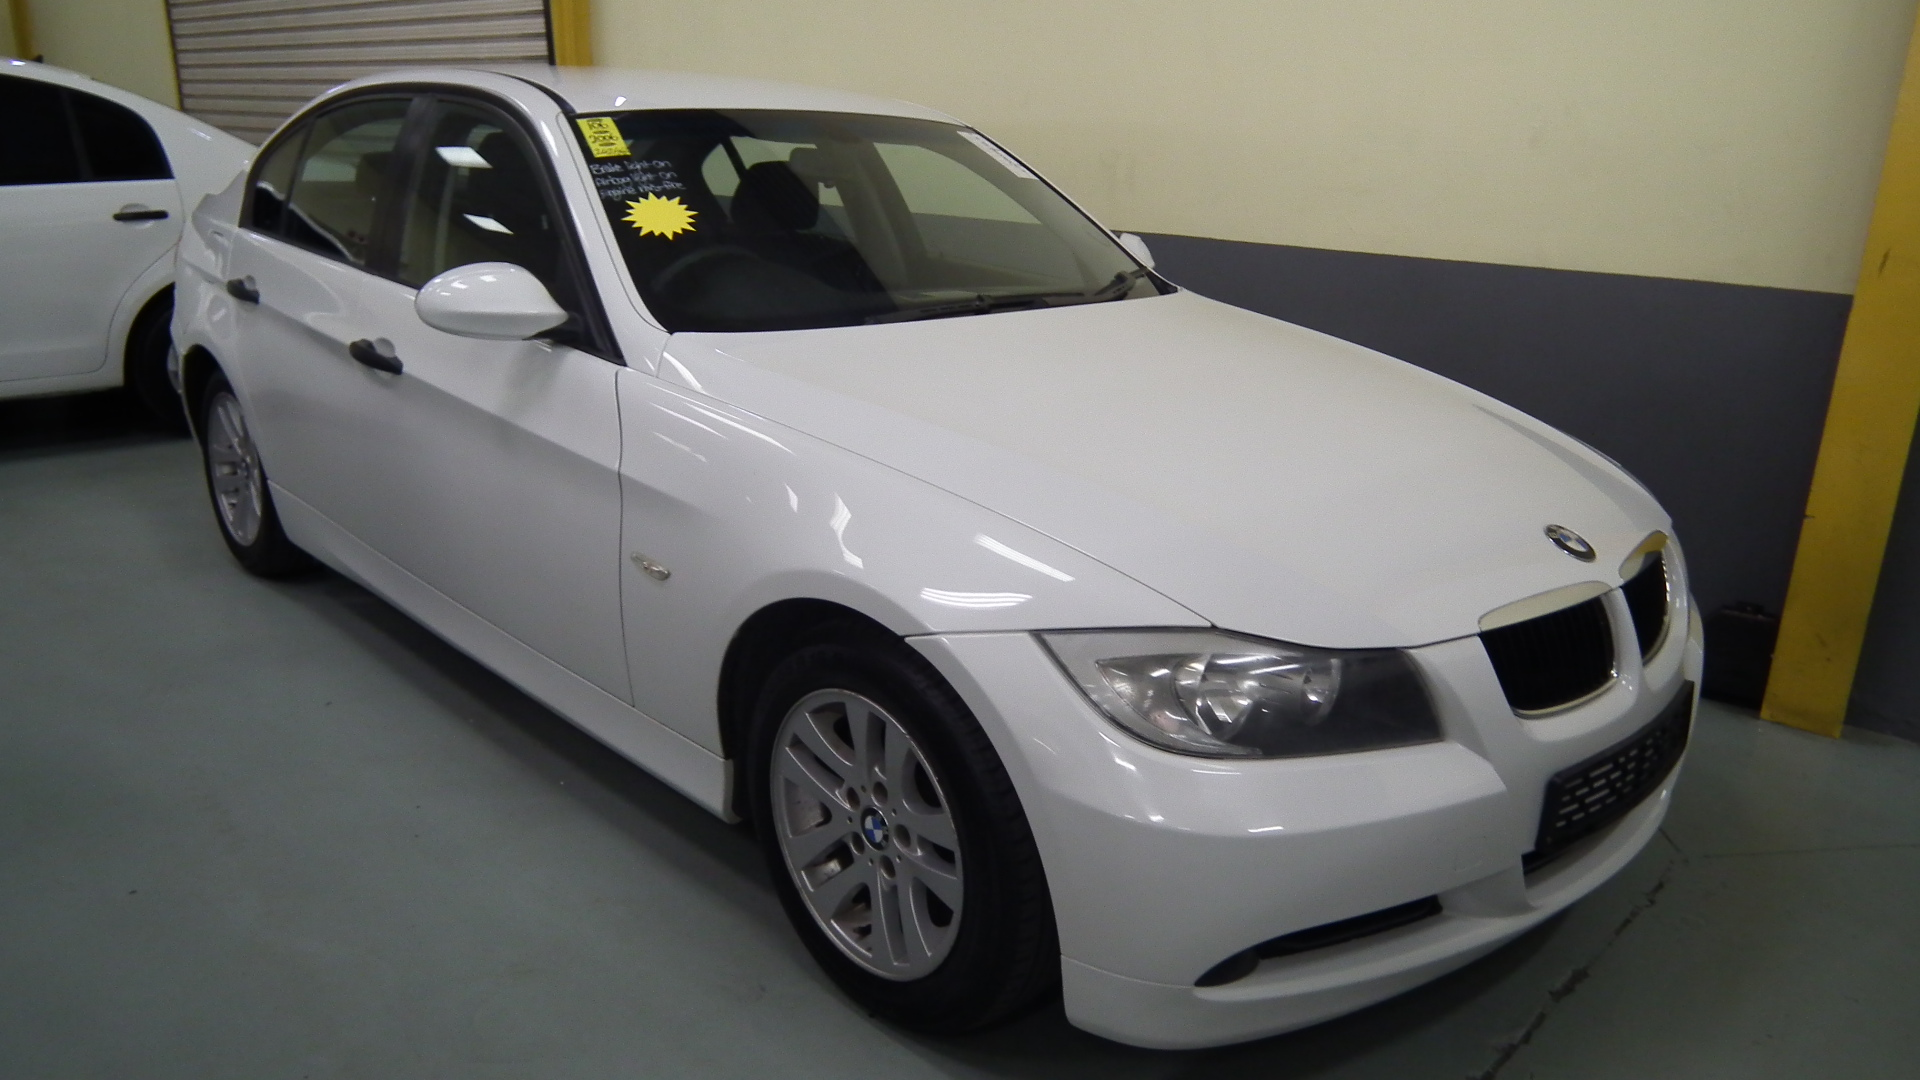 106 - 2006 BPF260B BMW 320i E90 (242466 kms) (BRAKE